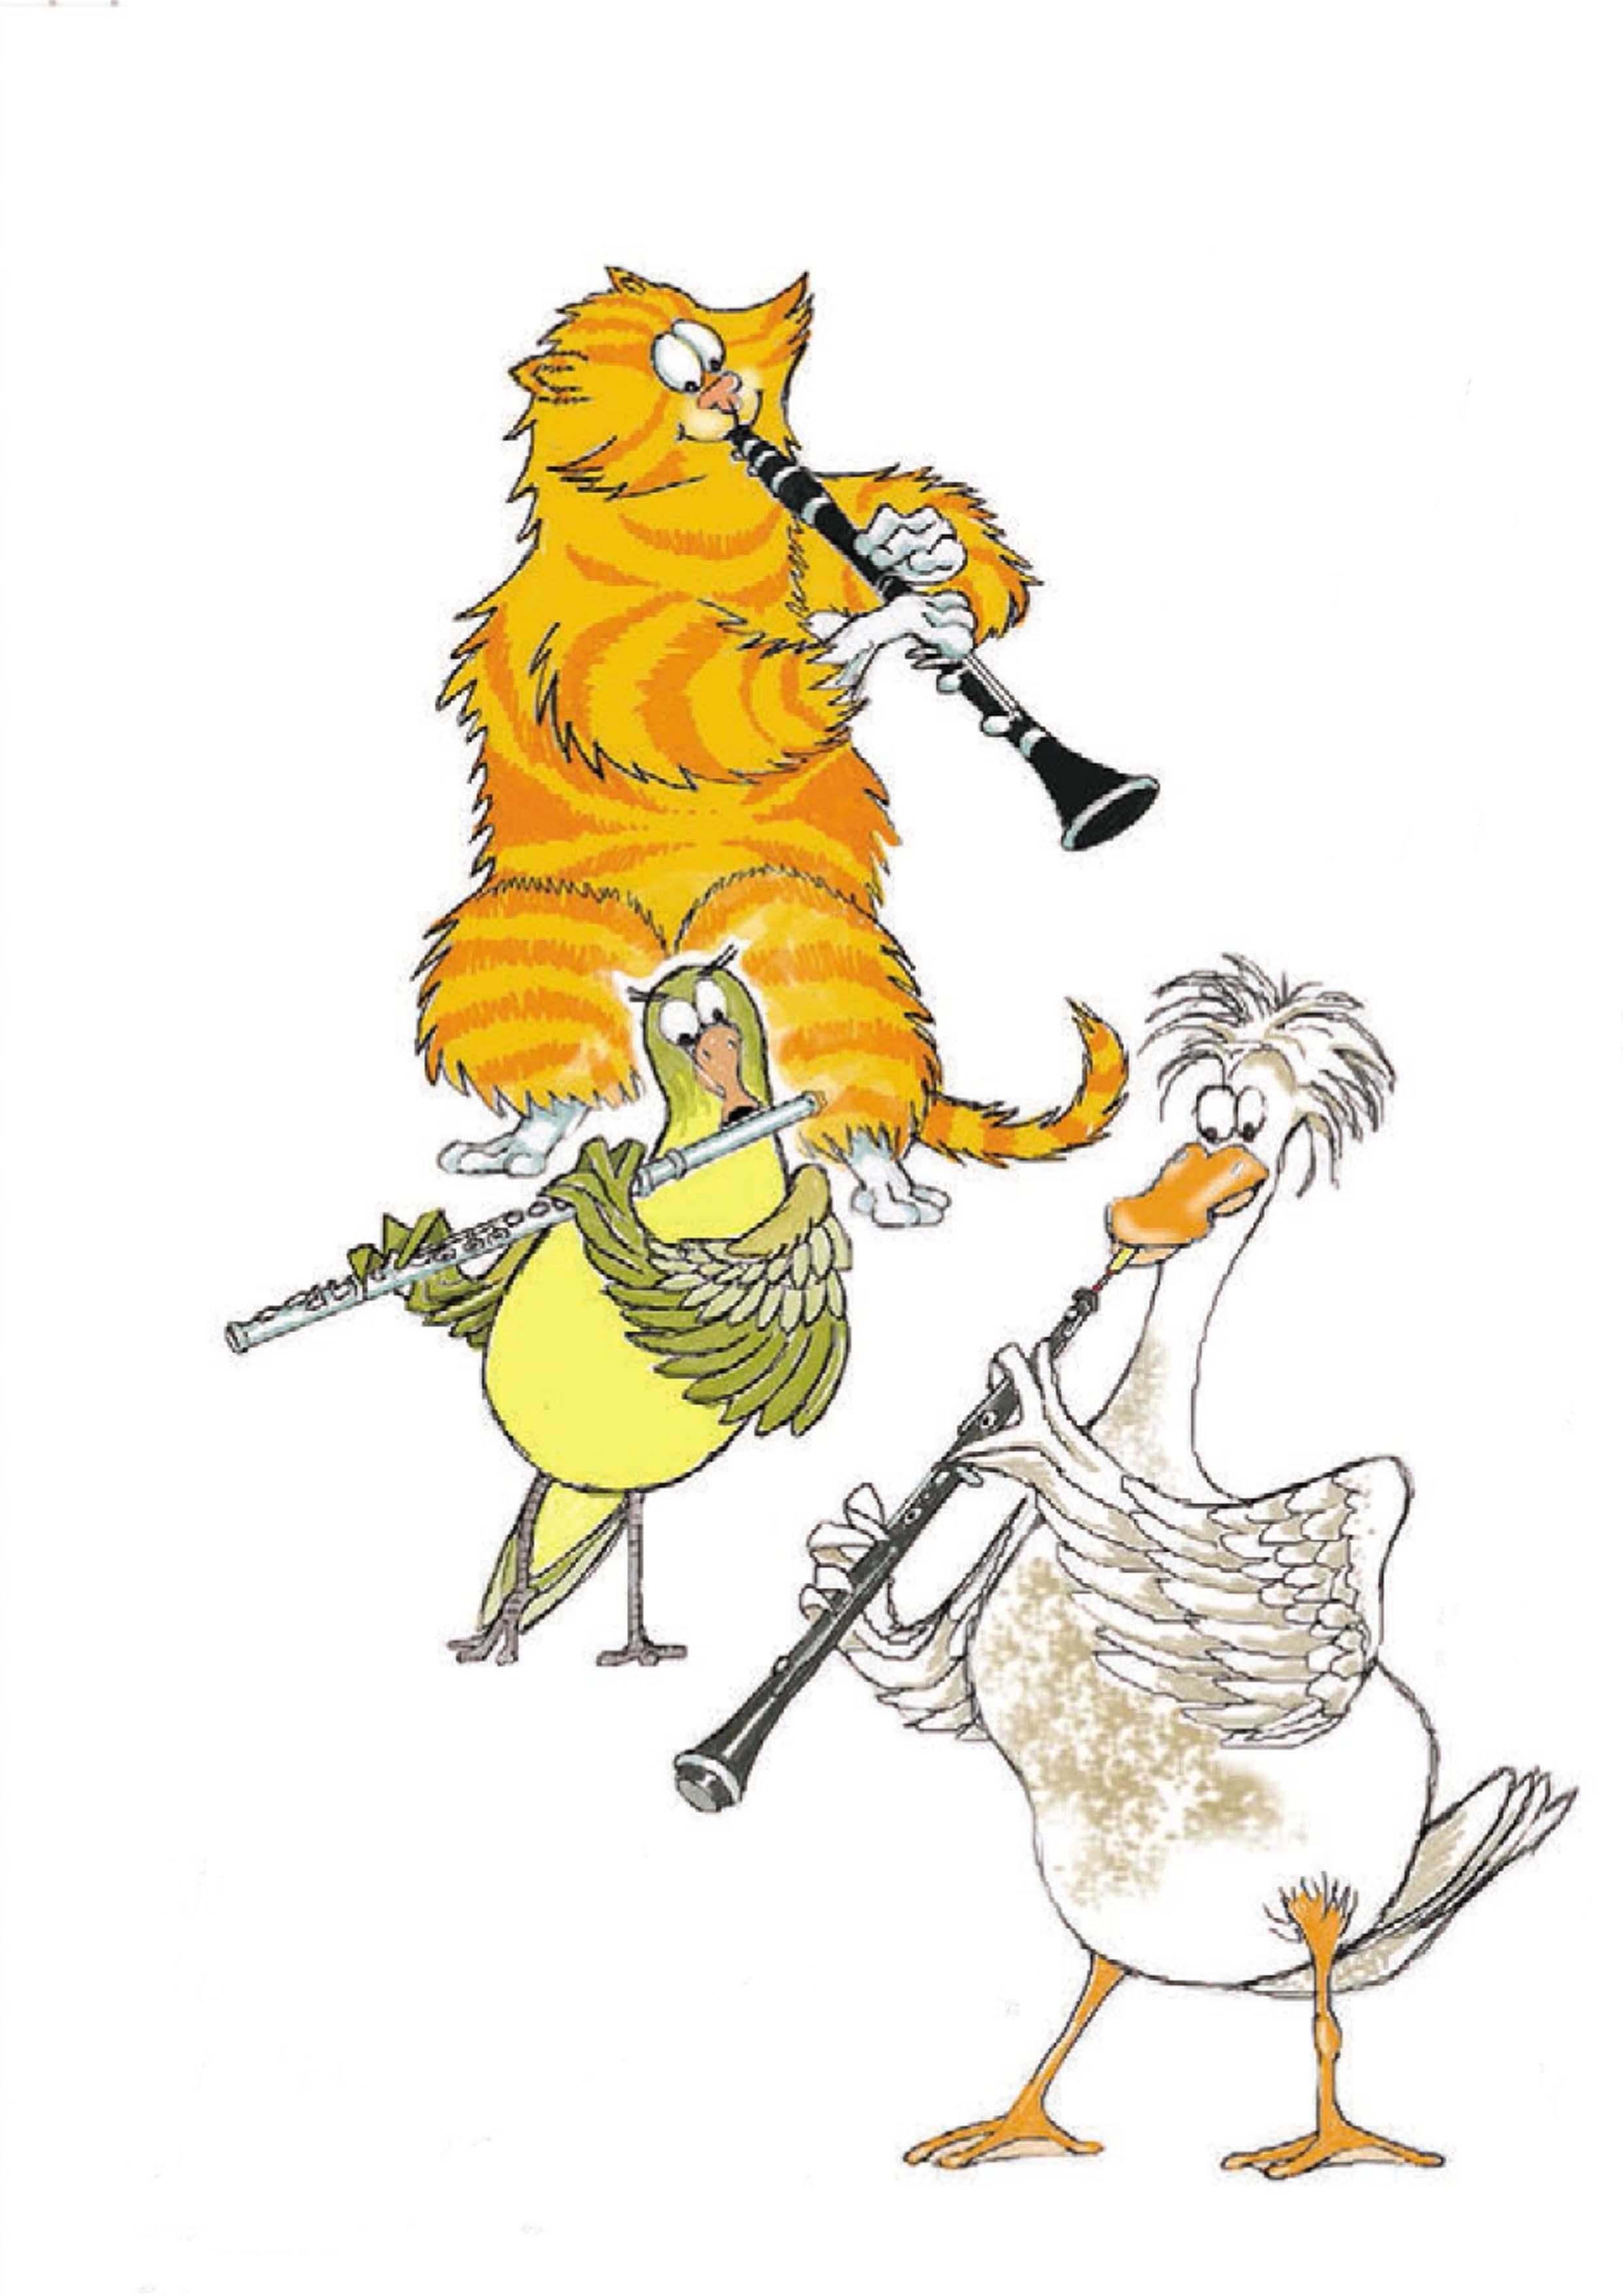 cat clarinet bird plays flute duck plays oboe